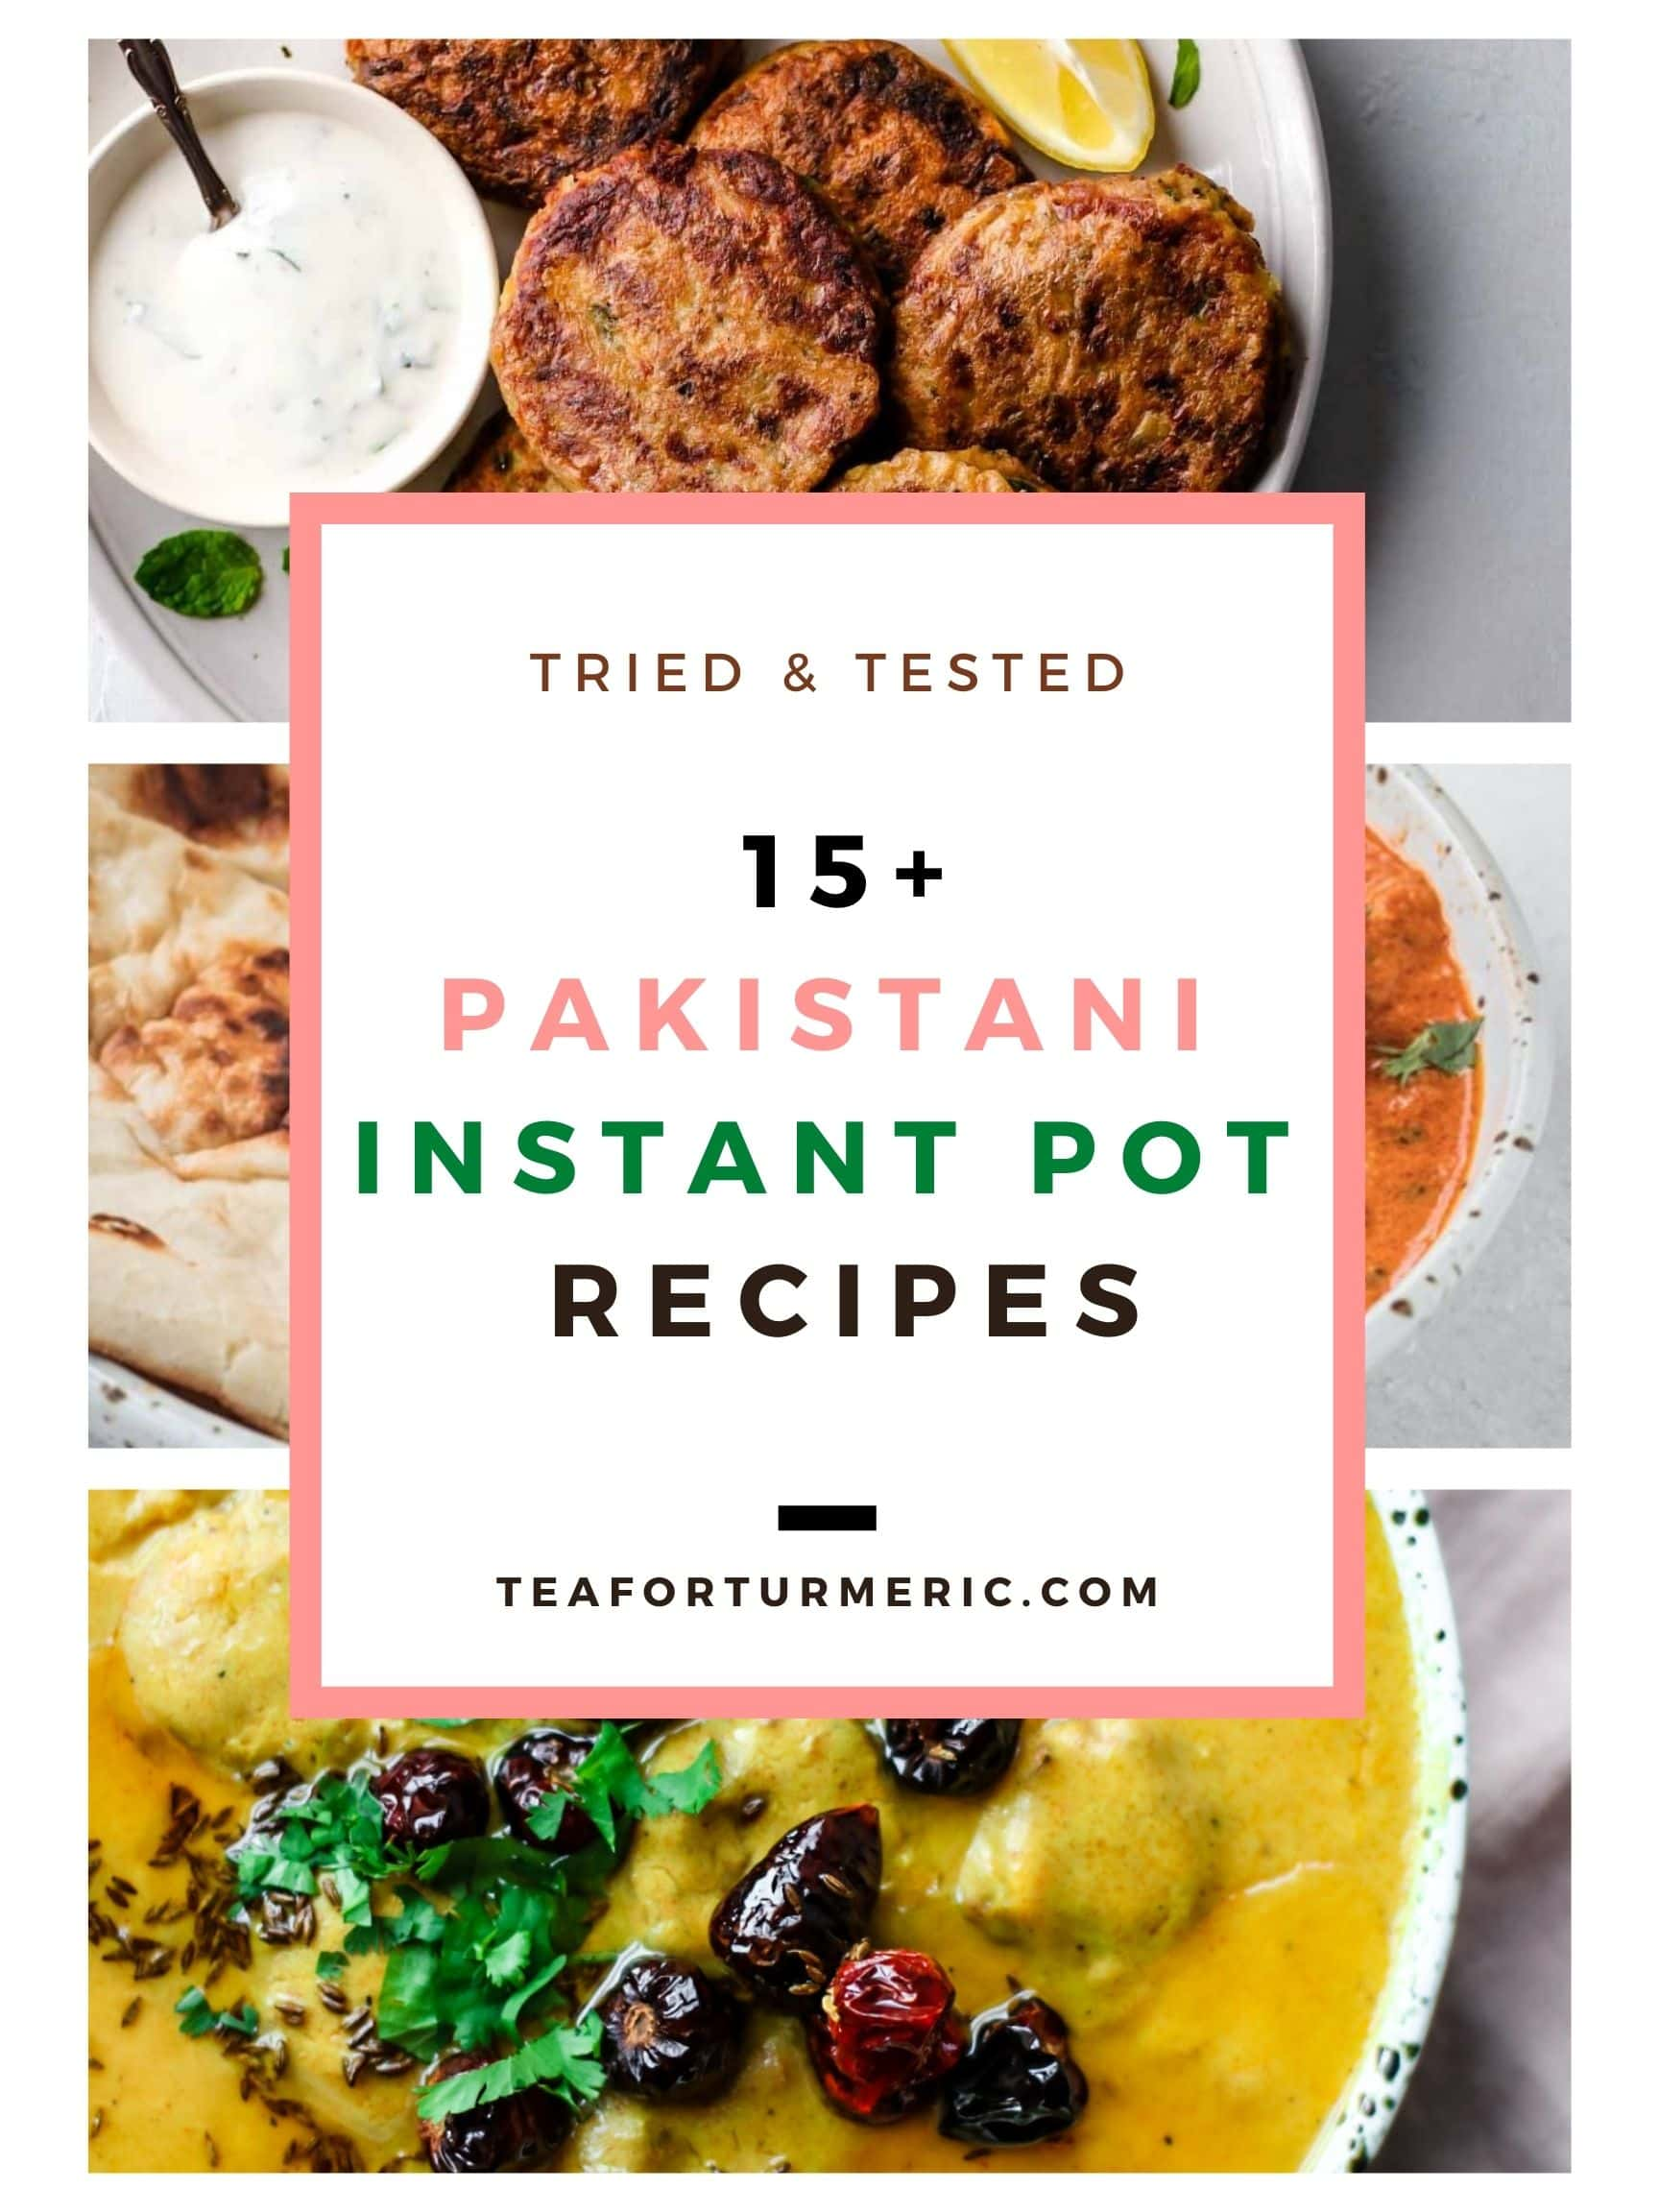 15+ Pakistani Instant Pot Recipes